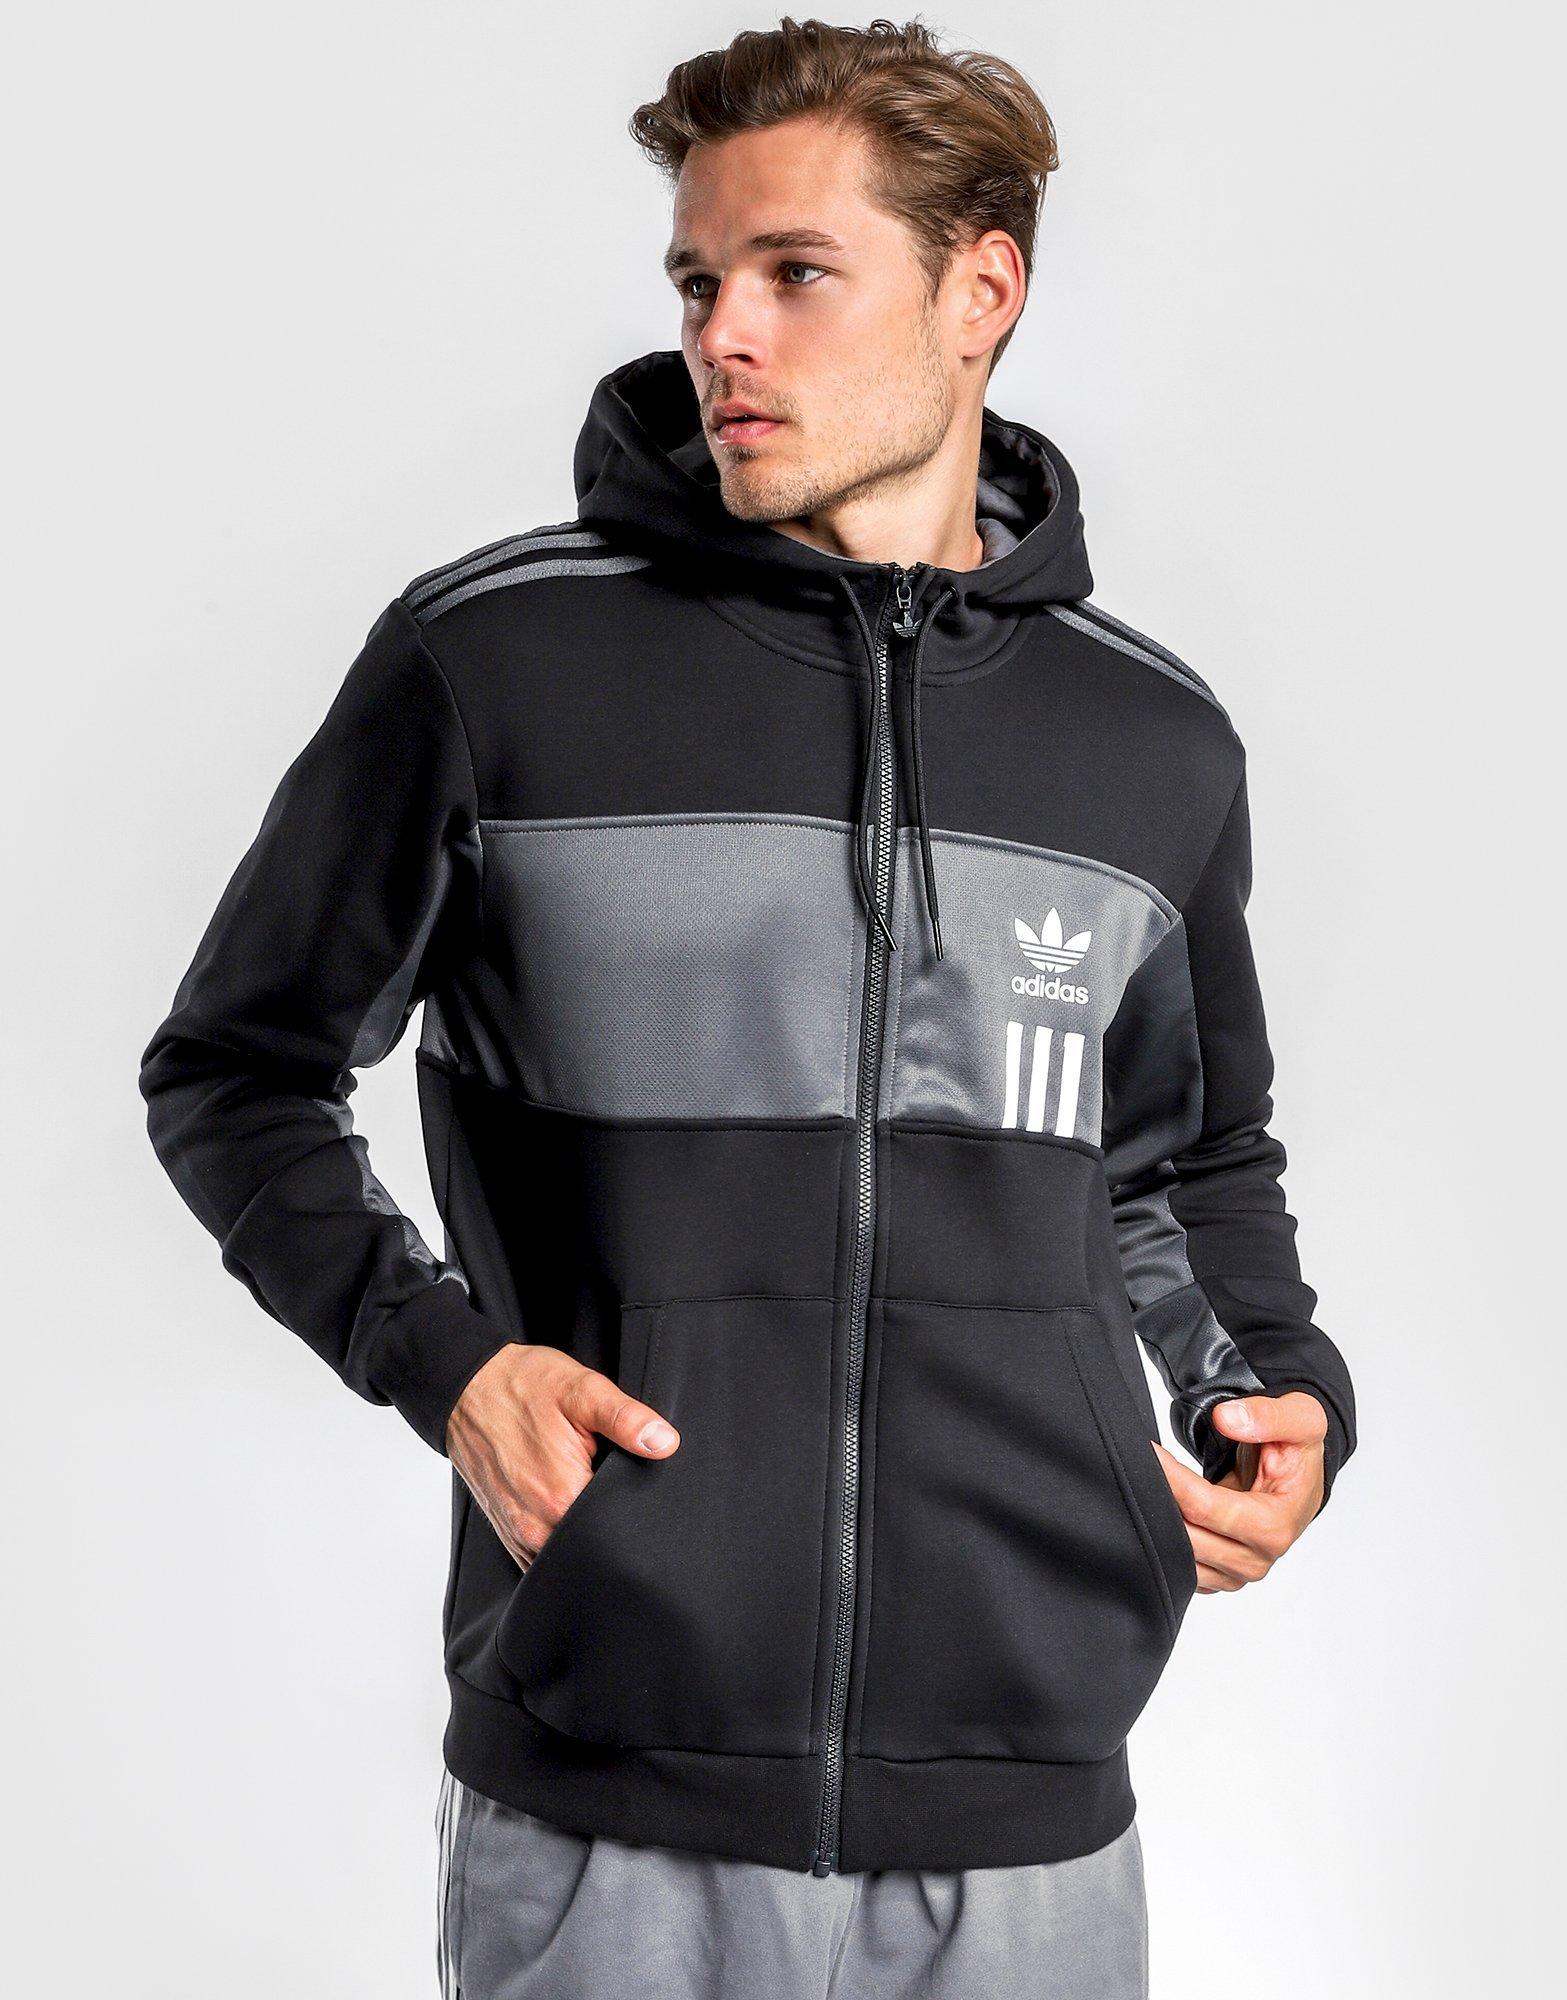 Adidas originals nmd full zip hoodie black men´s clothing